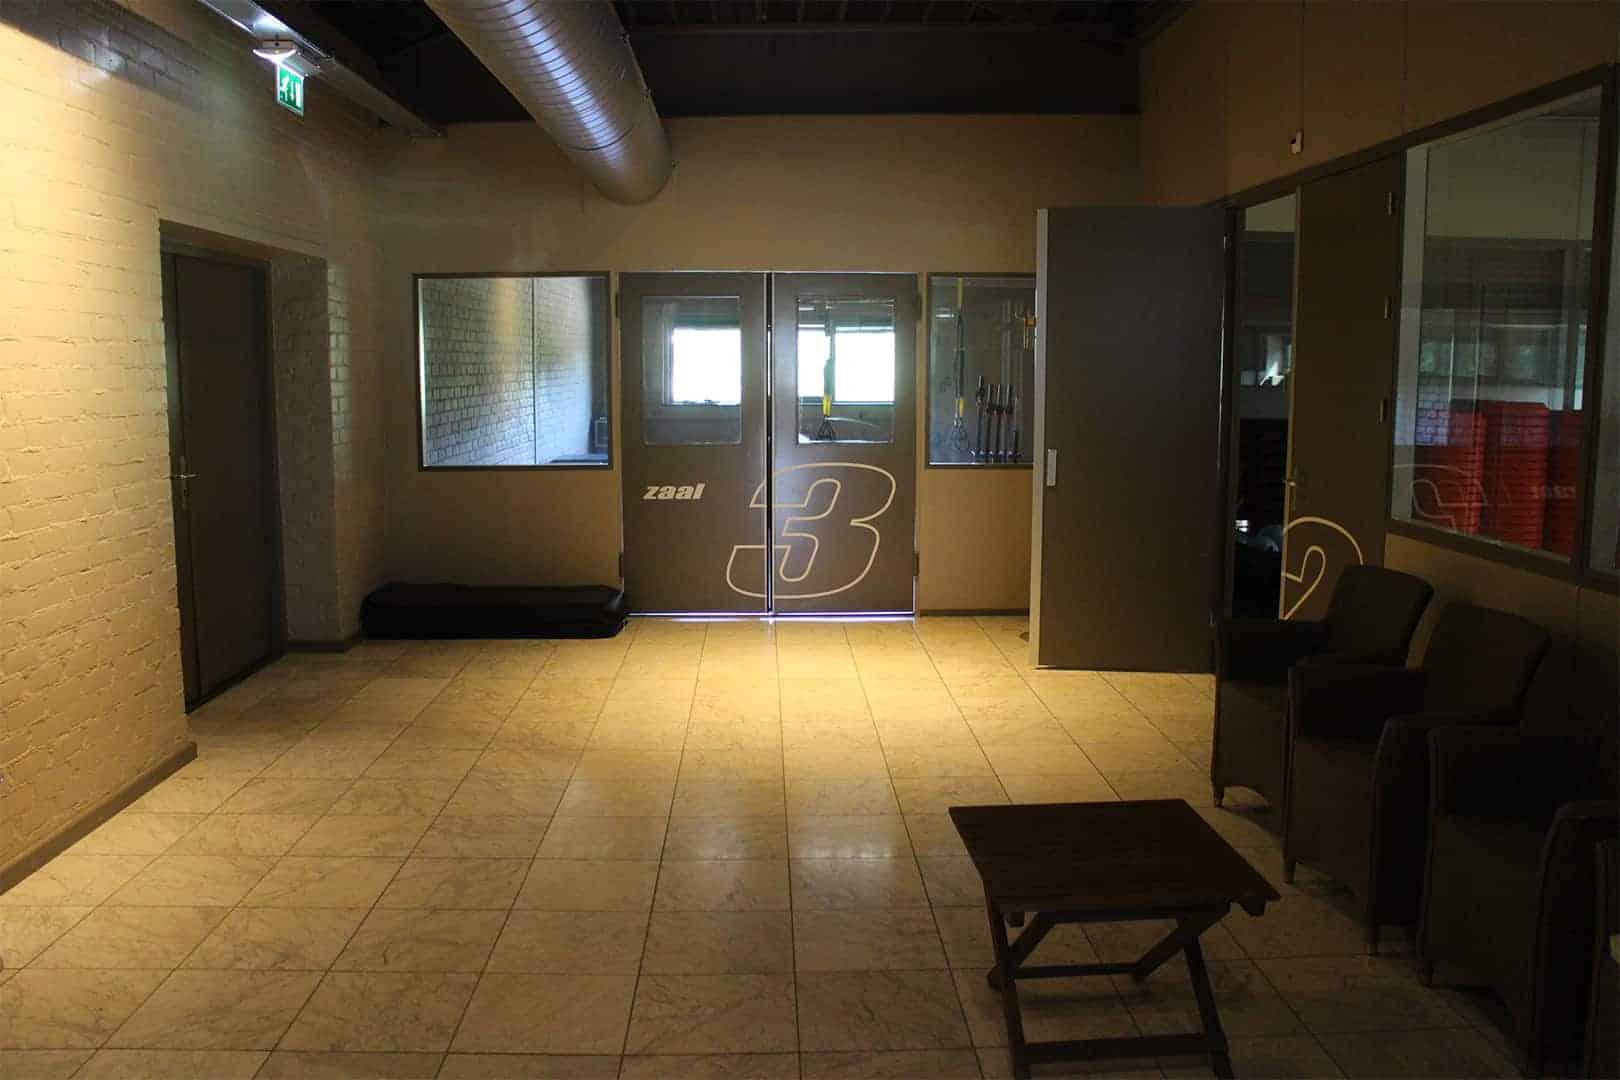 Wachtruimte Studiosport Tubbergen 158